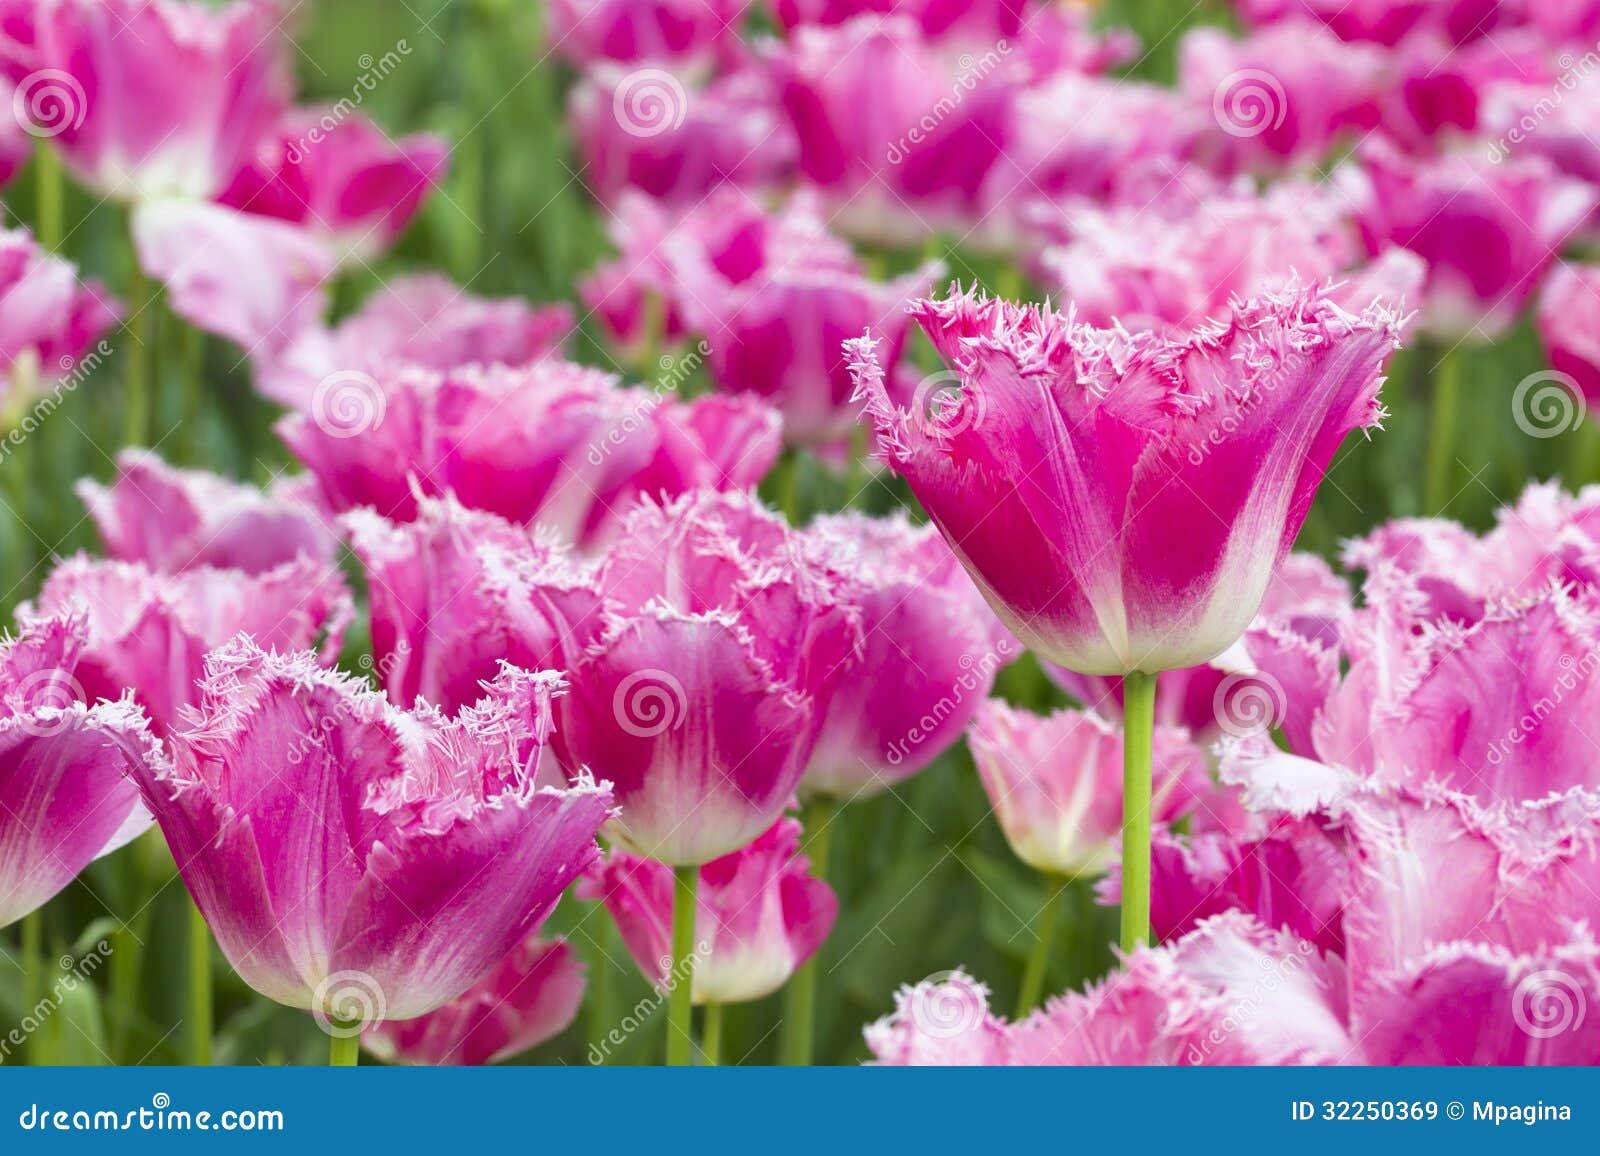 Tulips Stock Image Image Of Beautiful Color Rare Flora 32250369